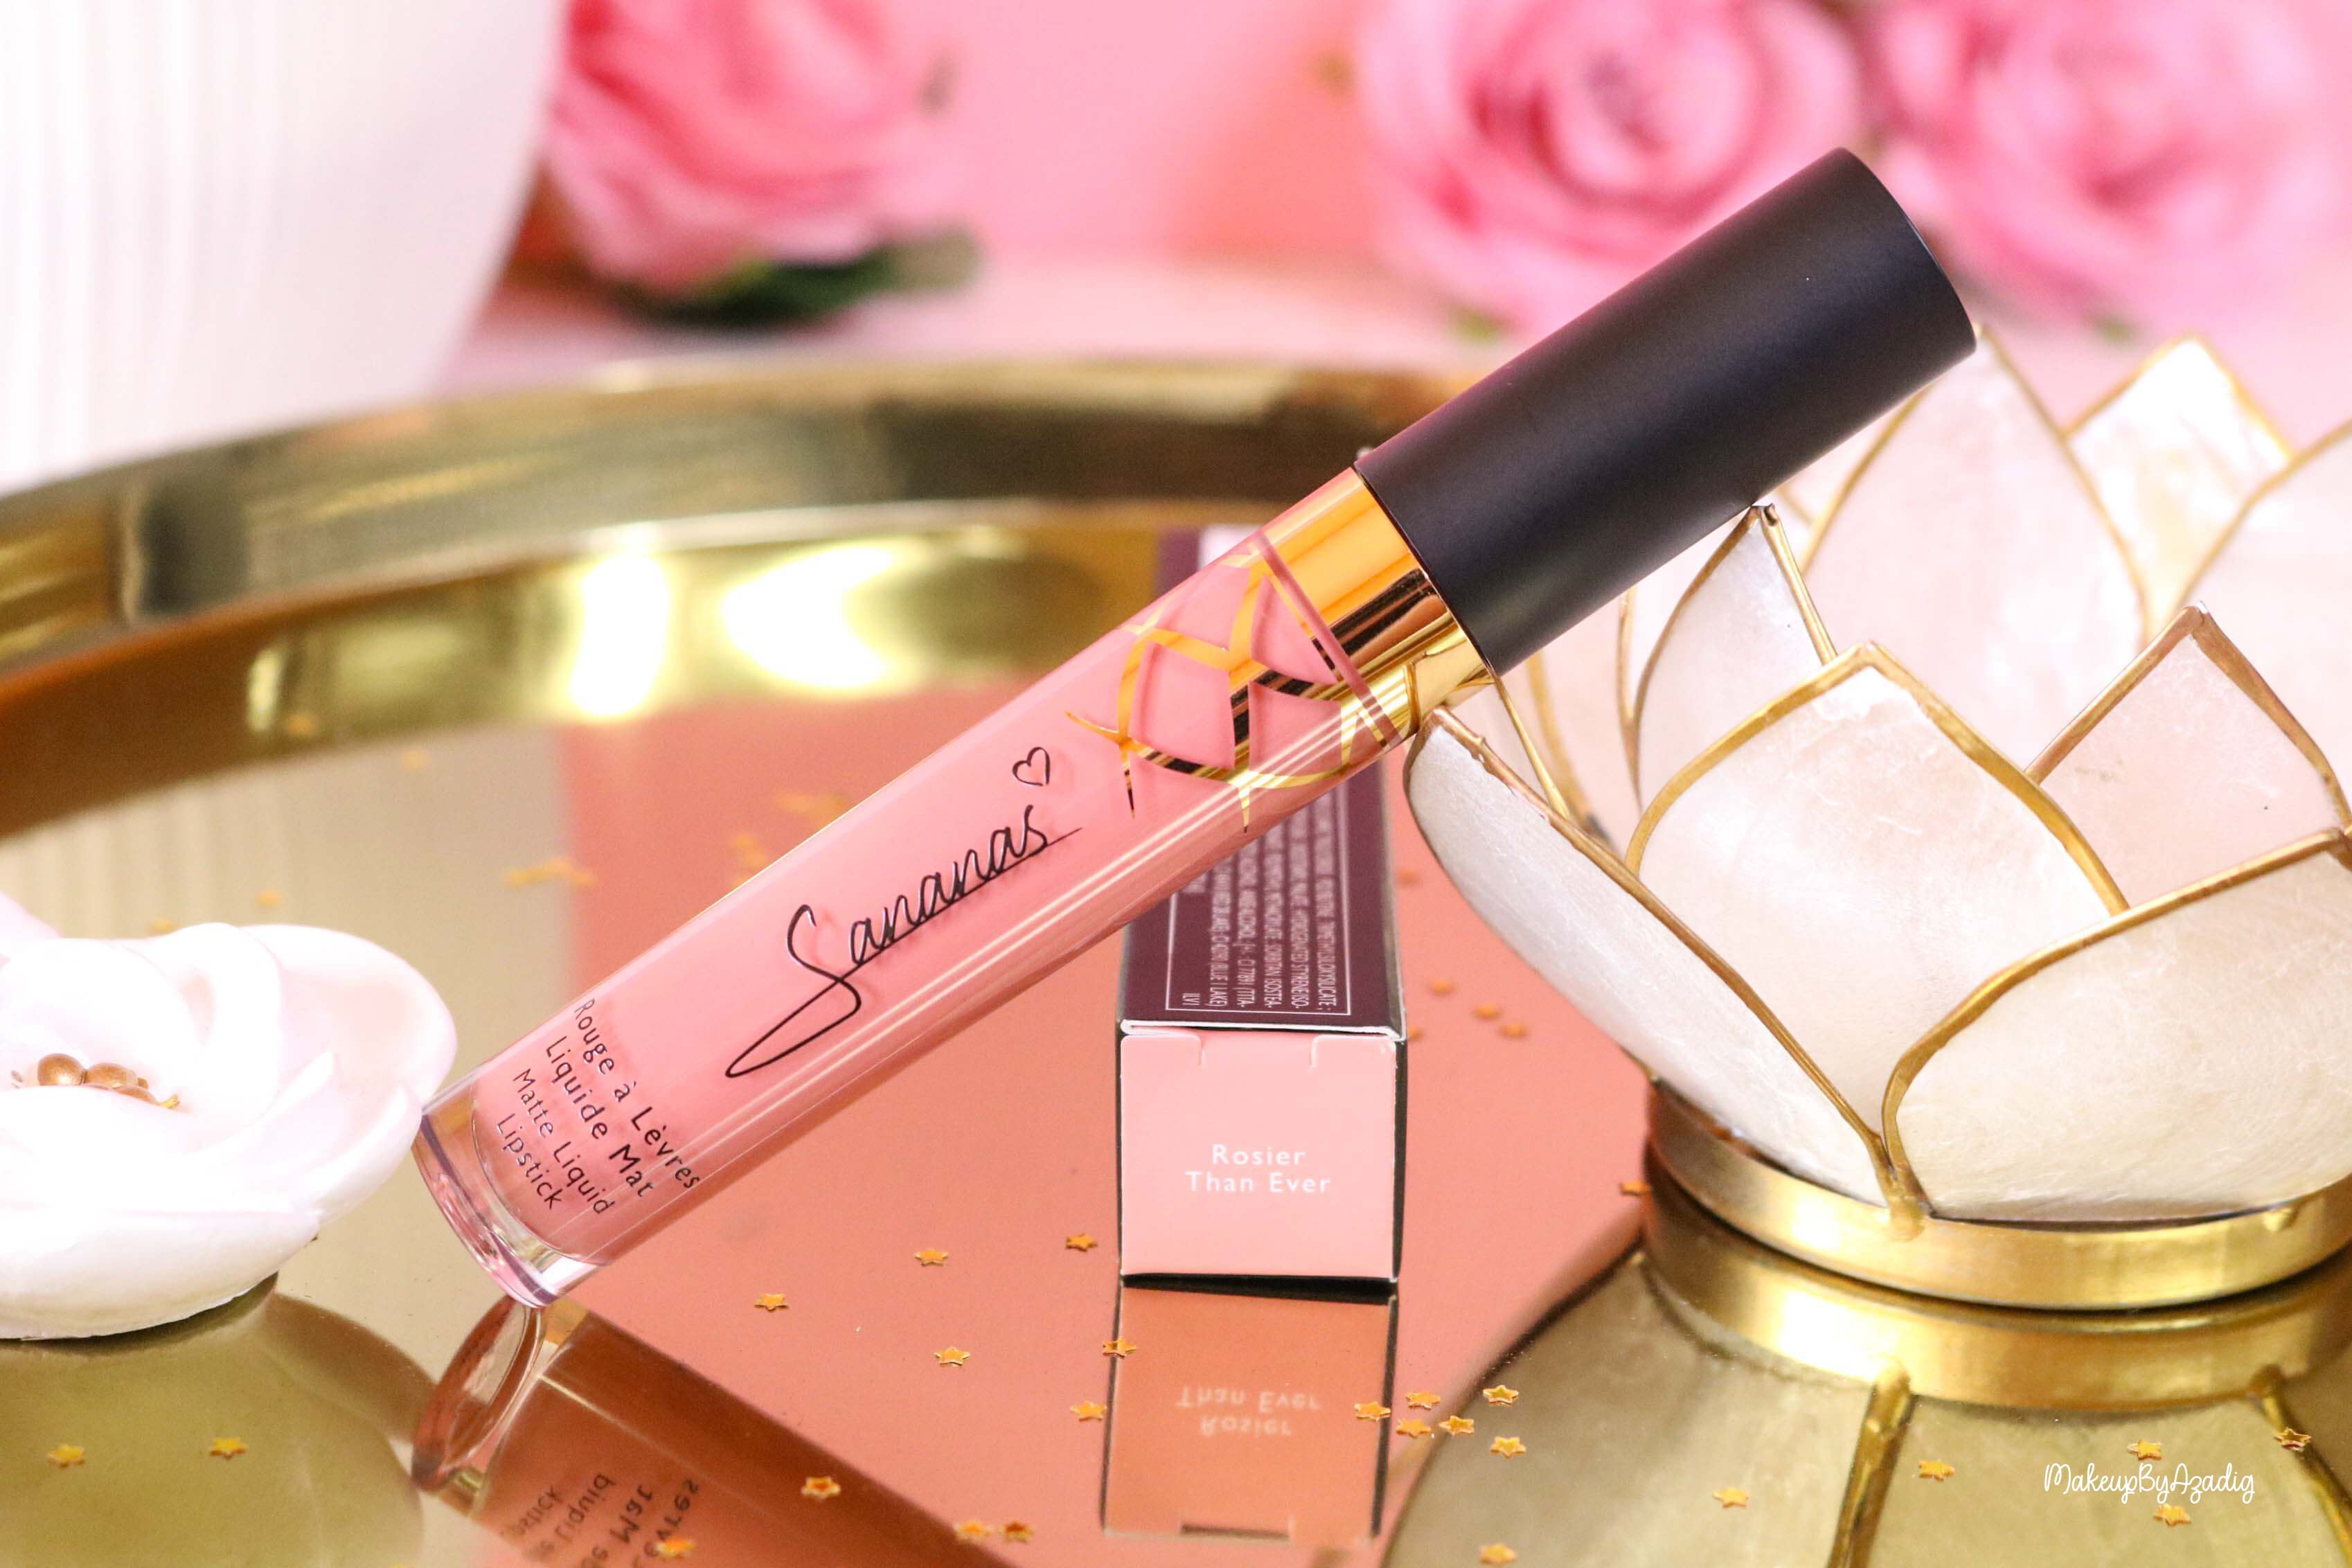 revue-marque-sananas-beauty-rouge-a-levres-vernis-kit-avis-prix-amazon-makeupbyazadig-dusty-pink-greige-rosier-ananas